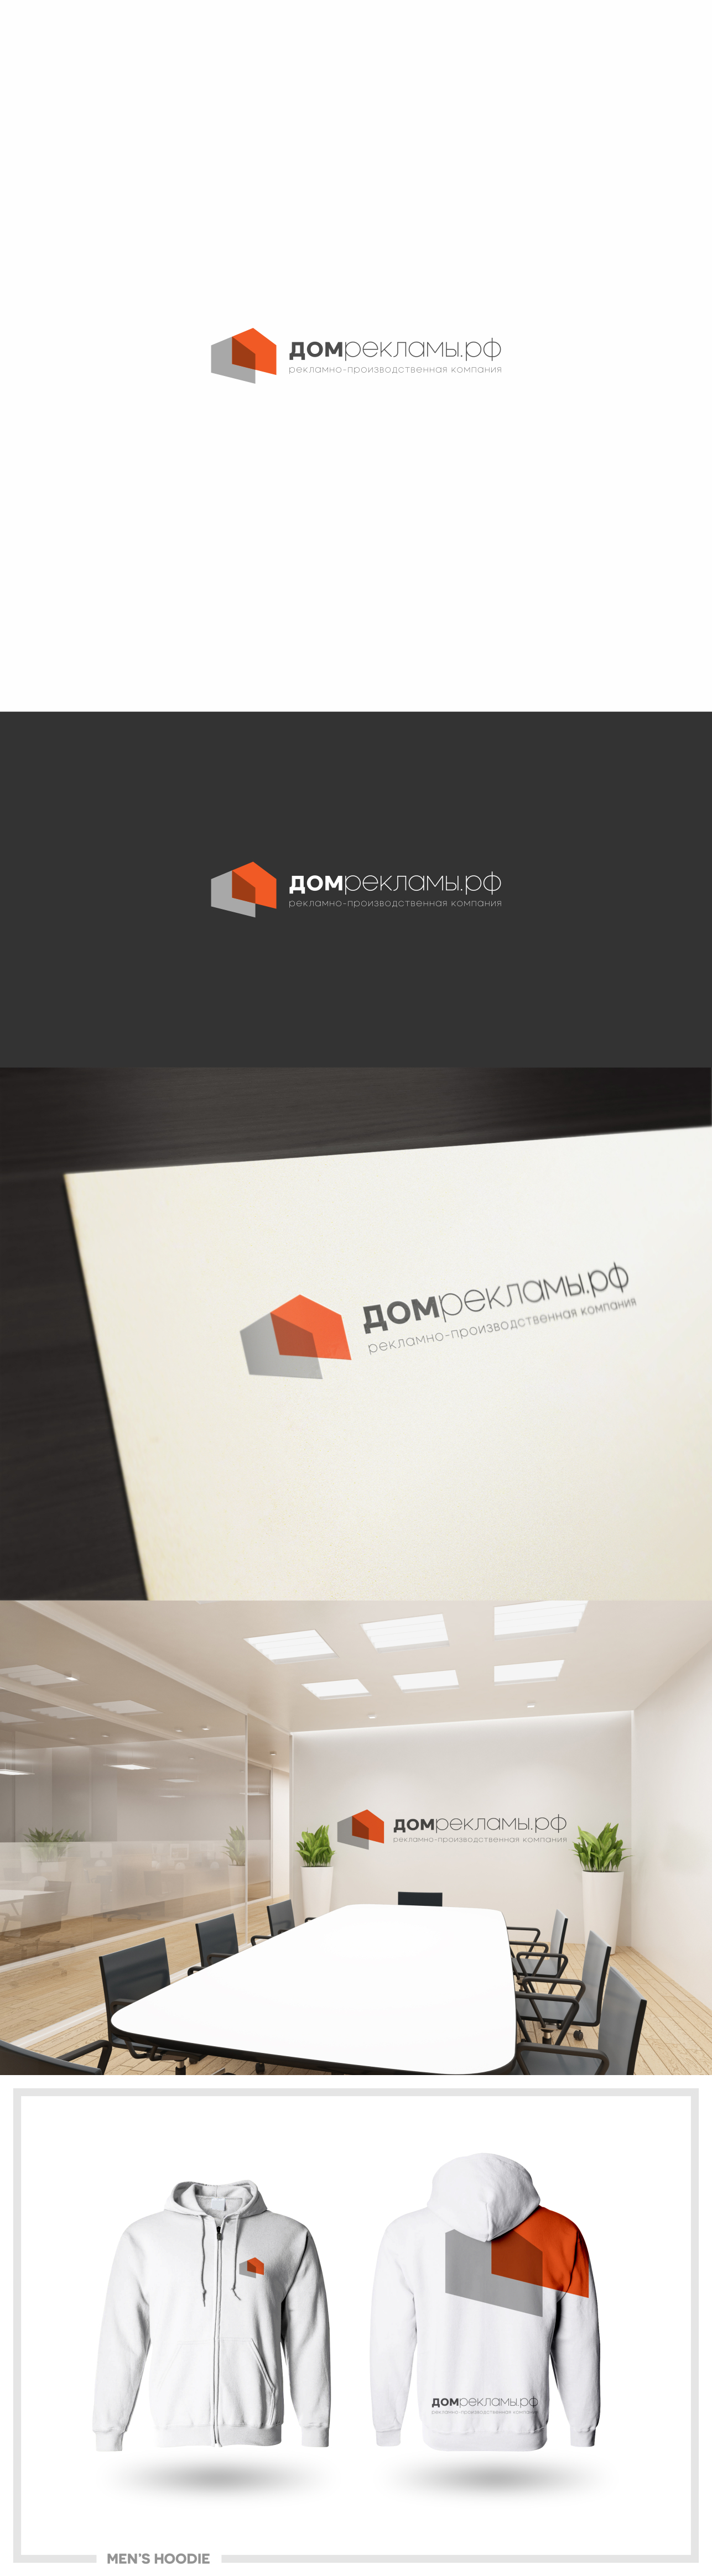 Дизайн логотипа рекламно-производственной компании фото f_3085ee09f7611dfa.jpg